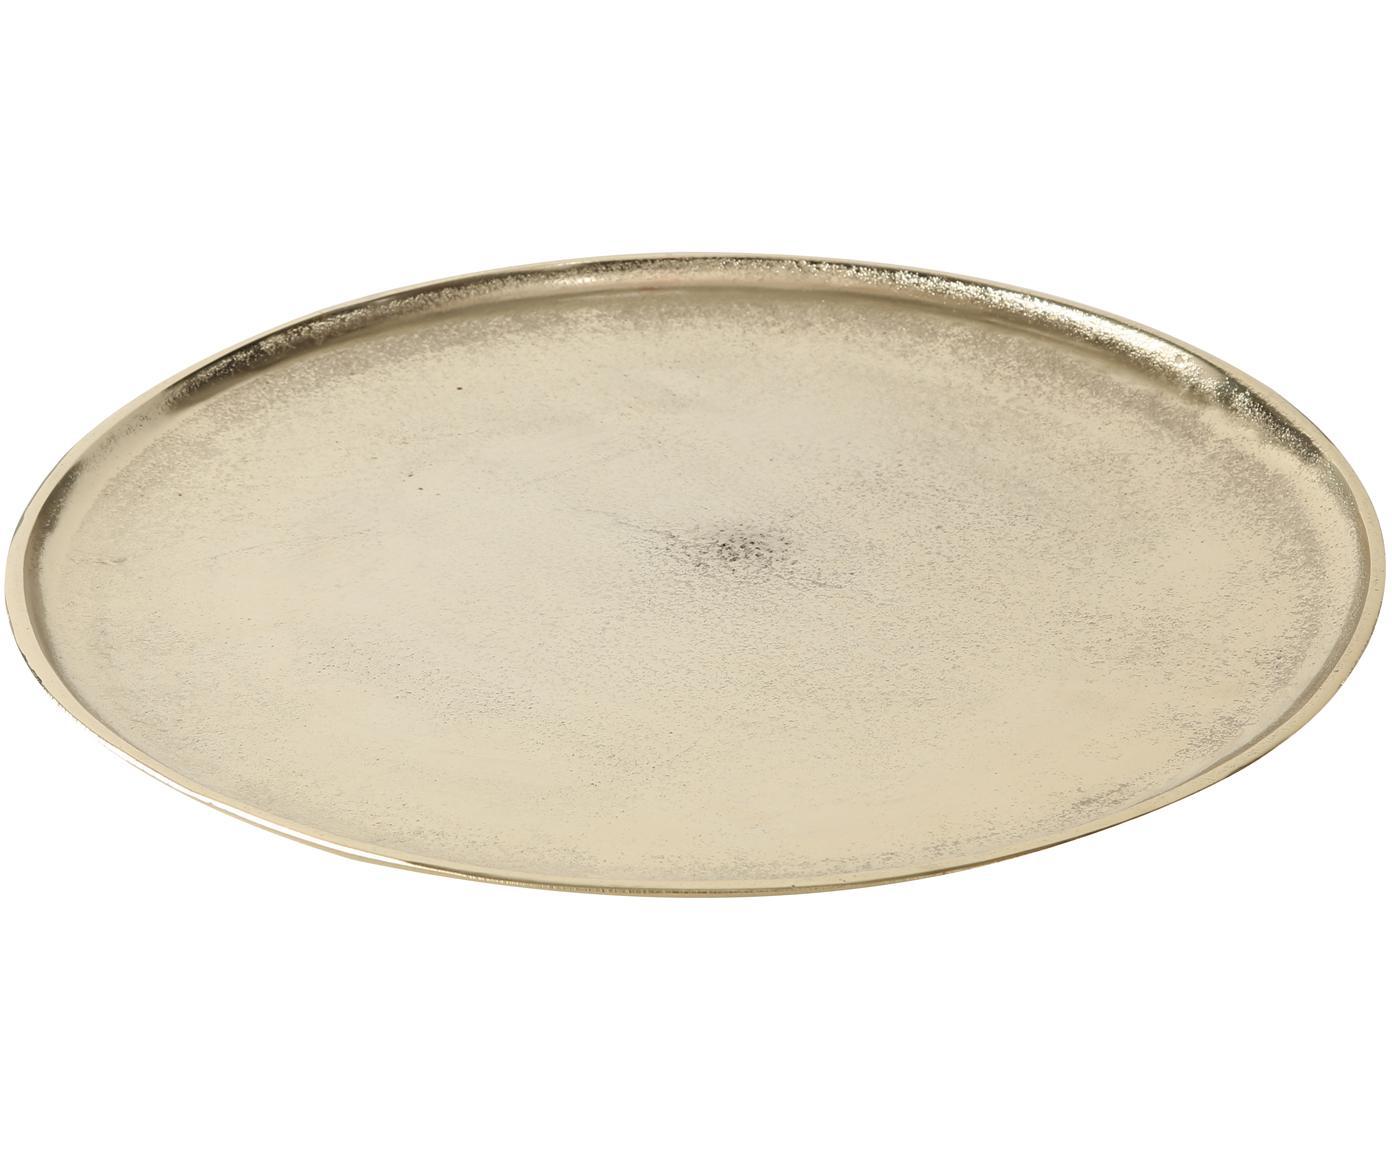 Vassoio decorativo Phönix, Alluminio, Ottonato, Ø 42 cm